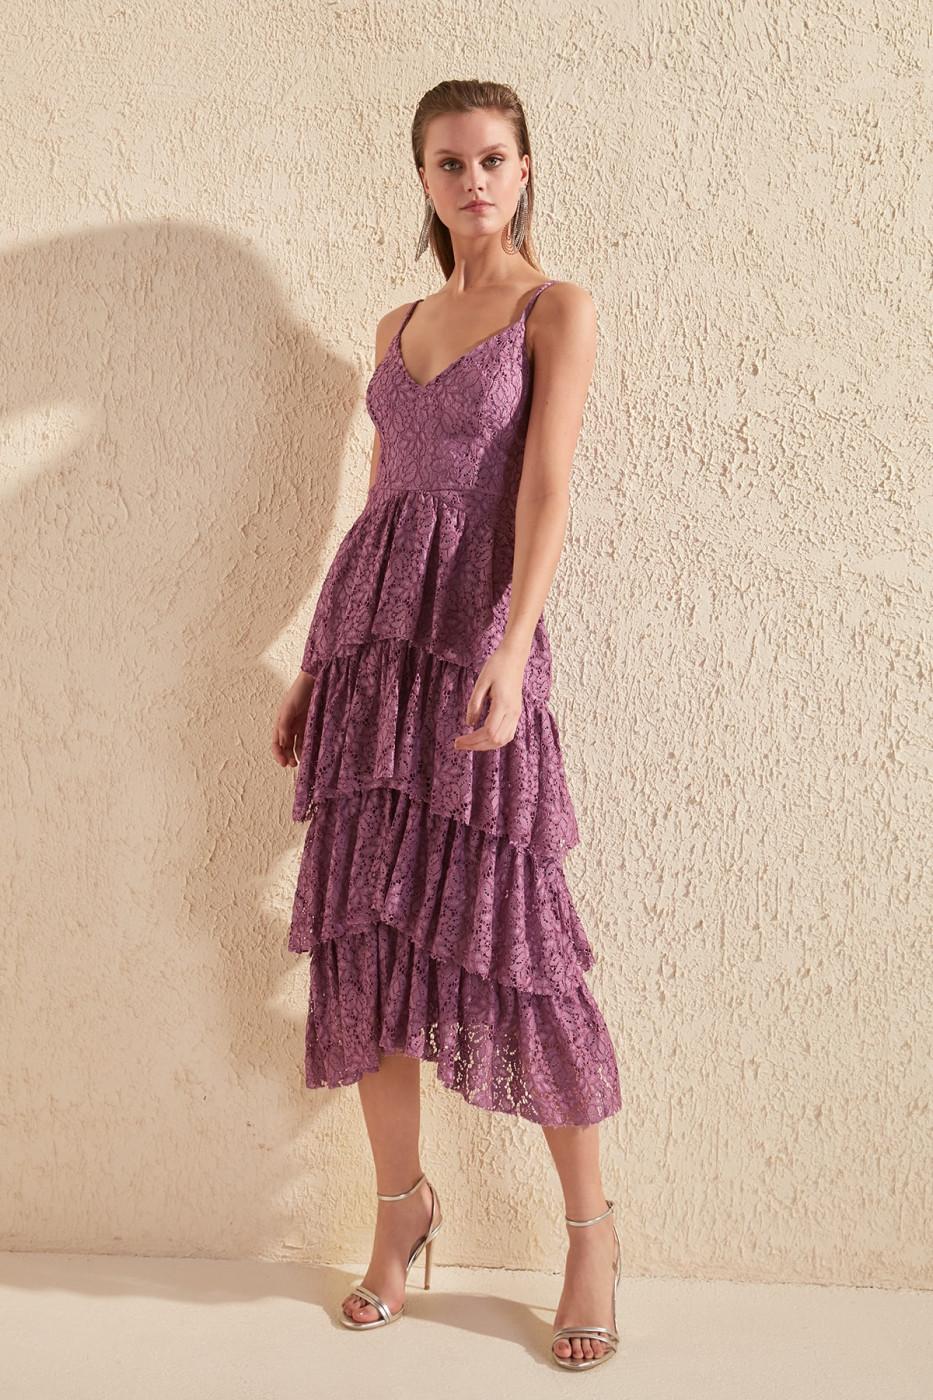 koronkowa-sukienka-na-wesele-z-falbankami